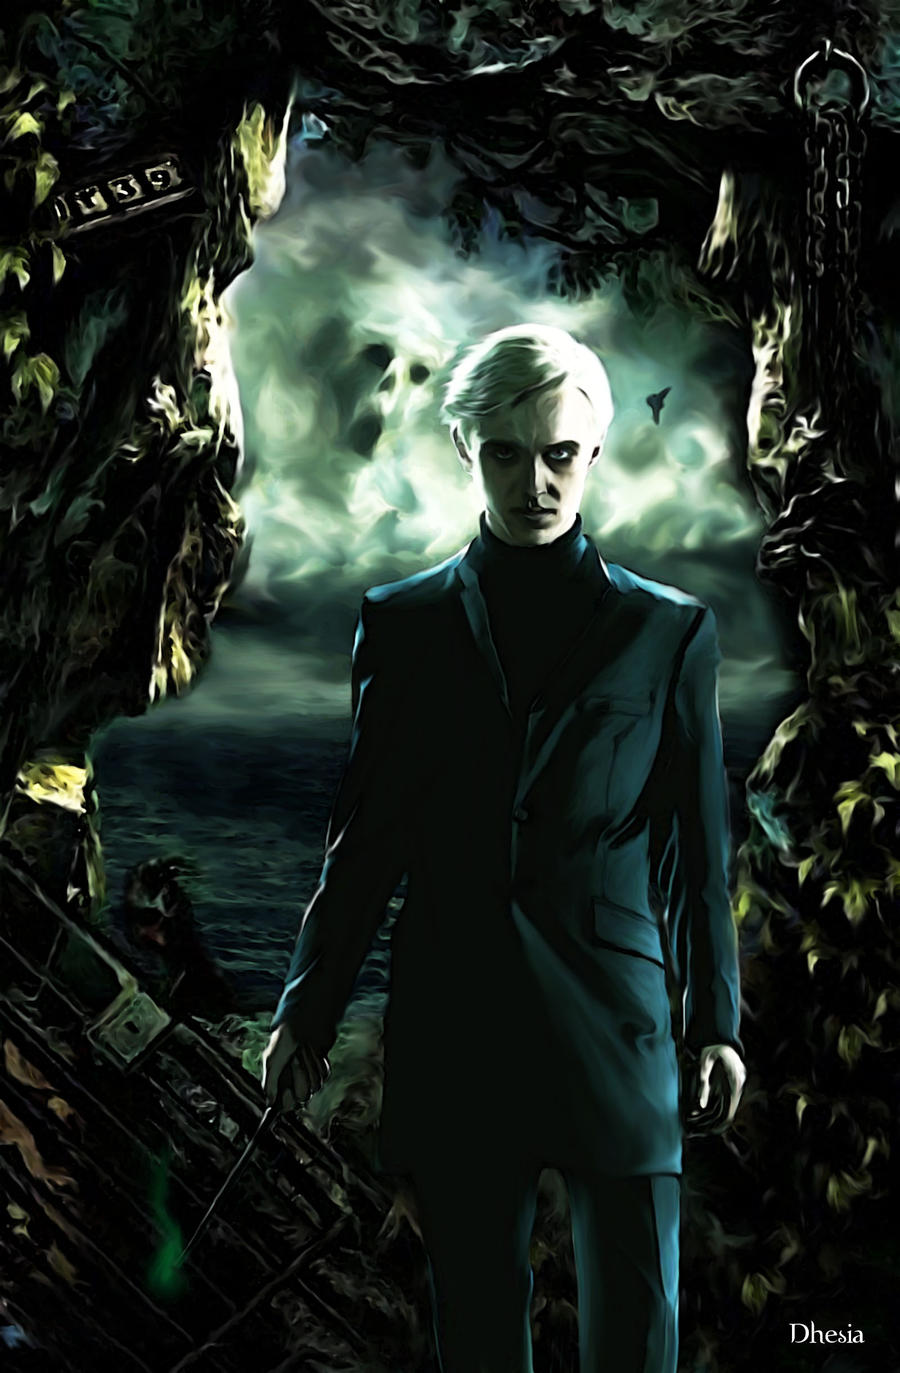 http://fc09.deviantart.net/fs50/i/2009/330/4/9/HP_hbp___Draco_Malfoy_by_Dhesia.jpg